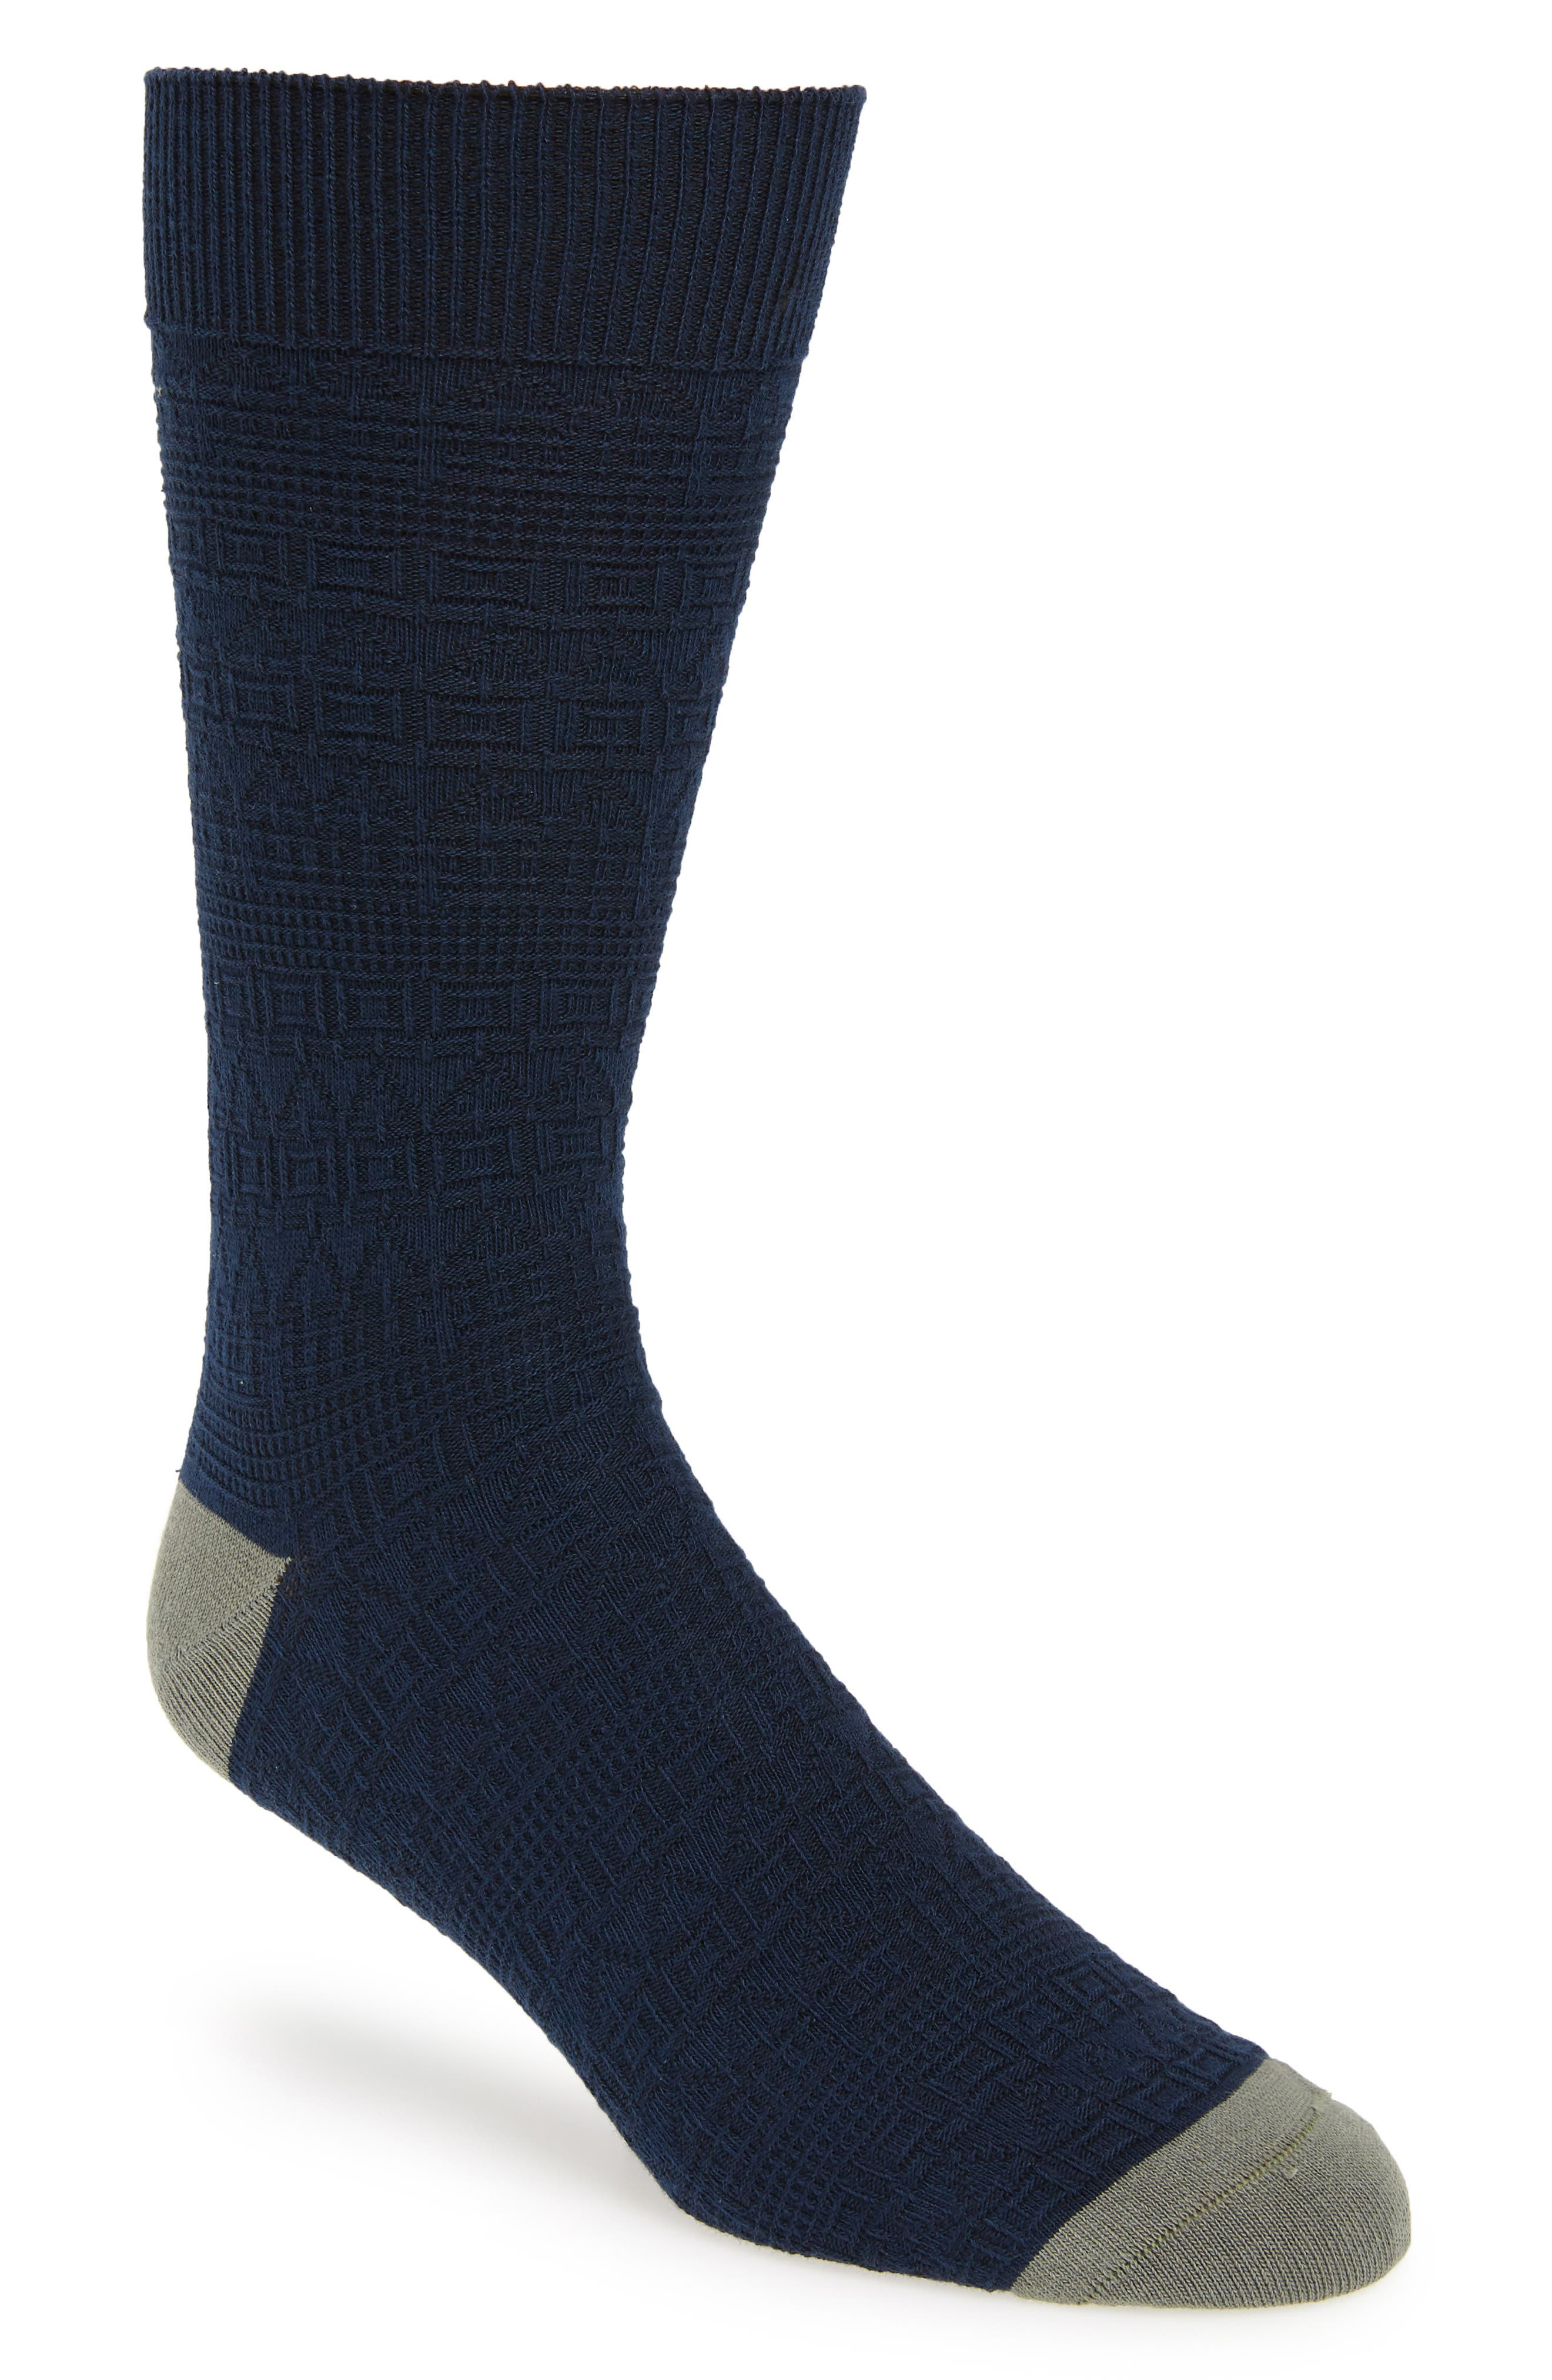 TED BAKER LONDON Textured Socks, Main, color, NAVY